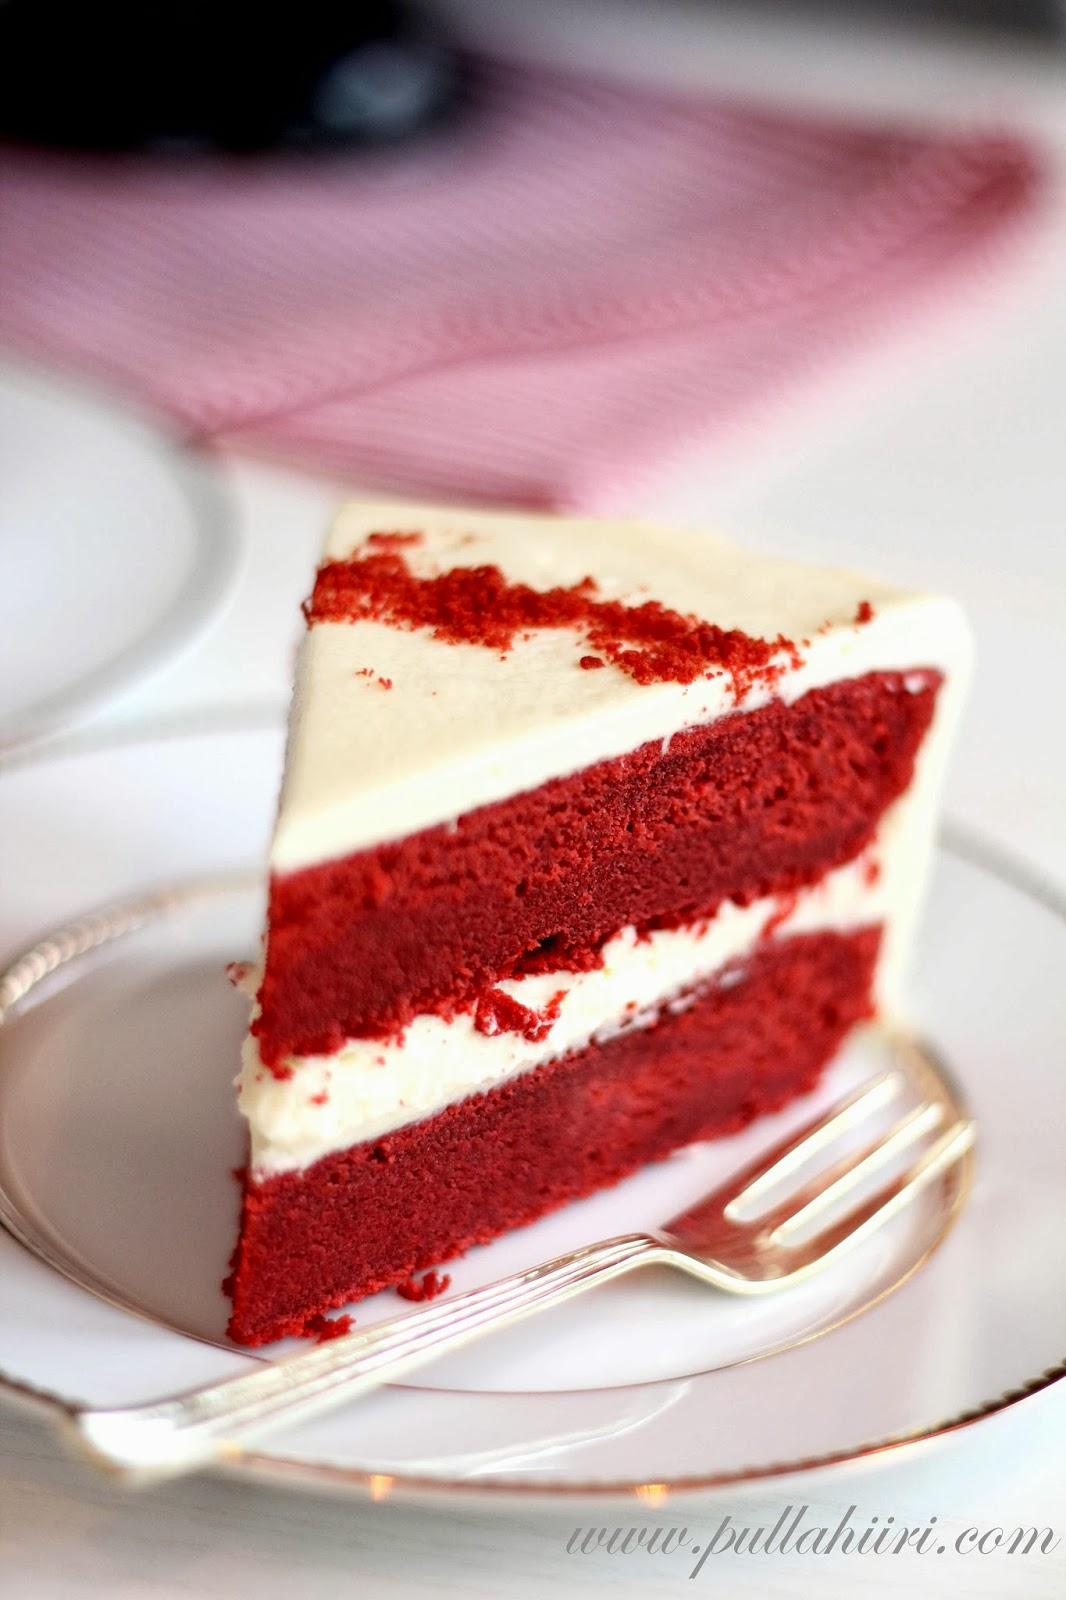 Торт велюр рецепт пошагово